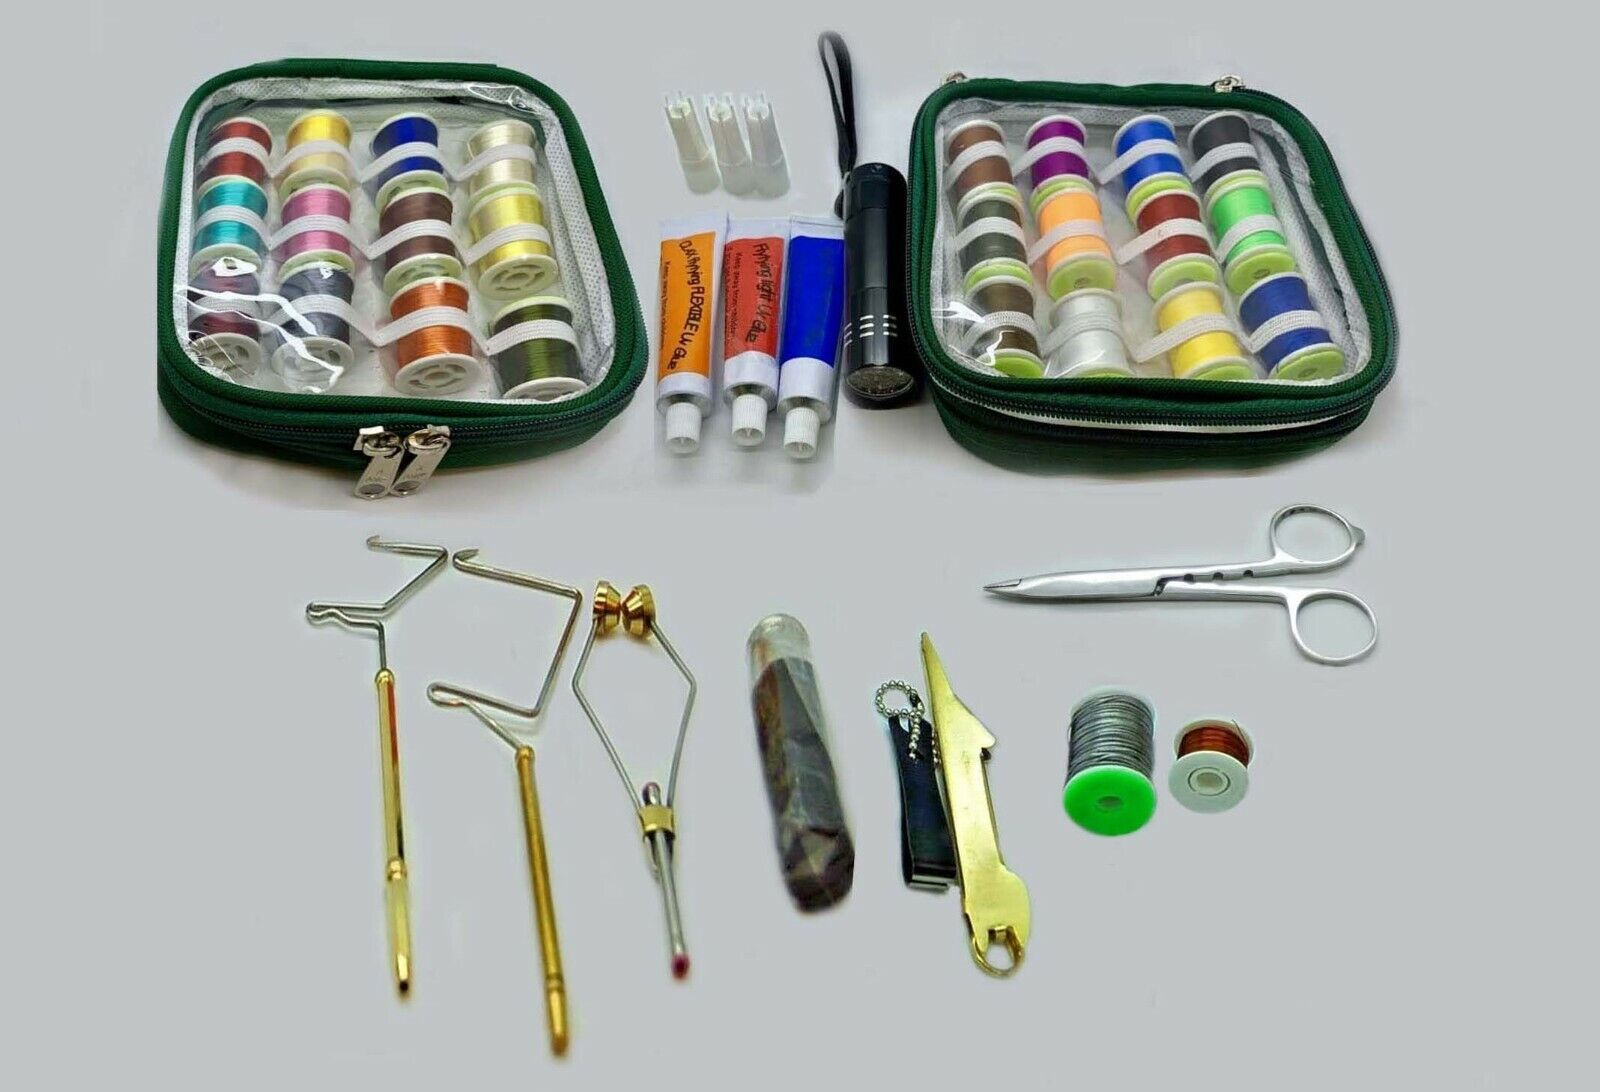 Mounting kit flies with uv glue dense, clear, flexible, uv light